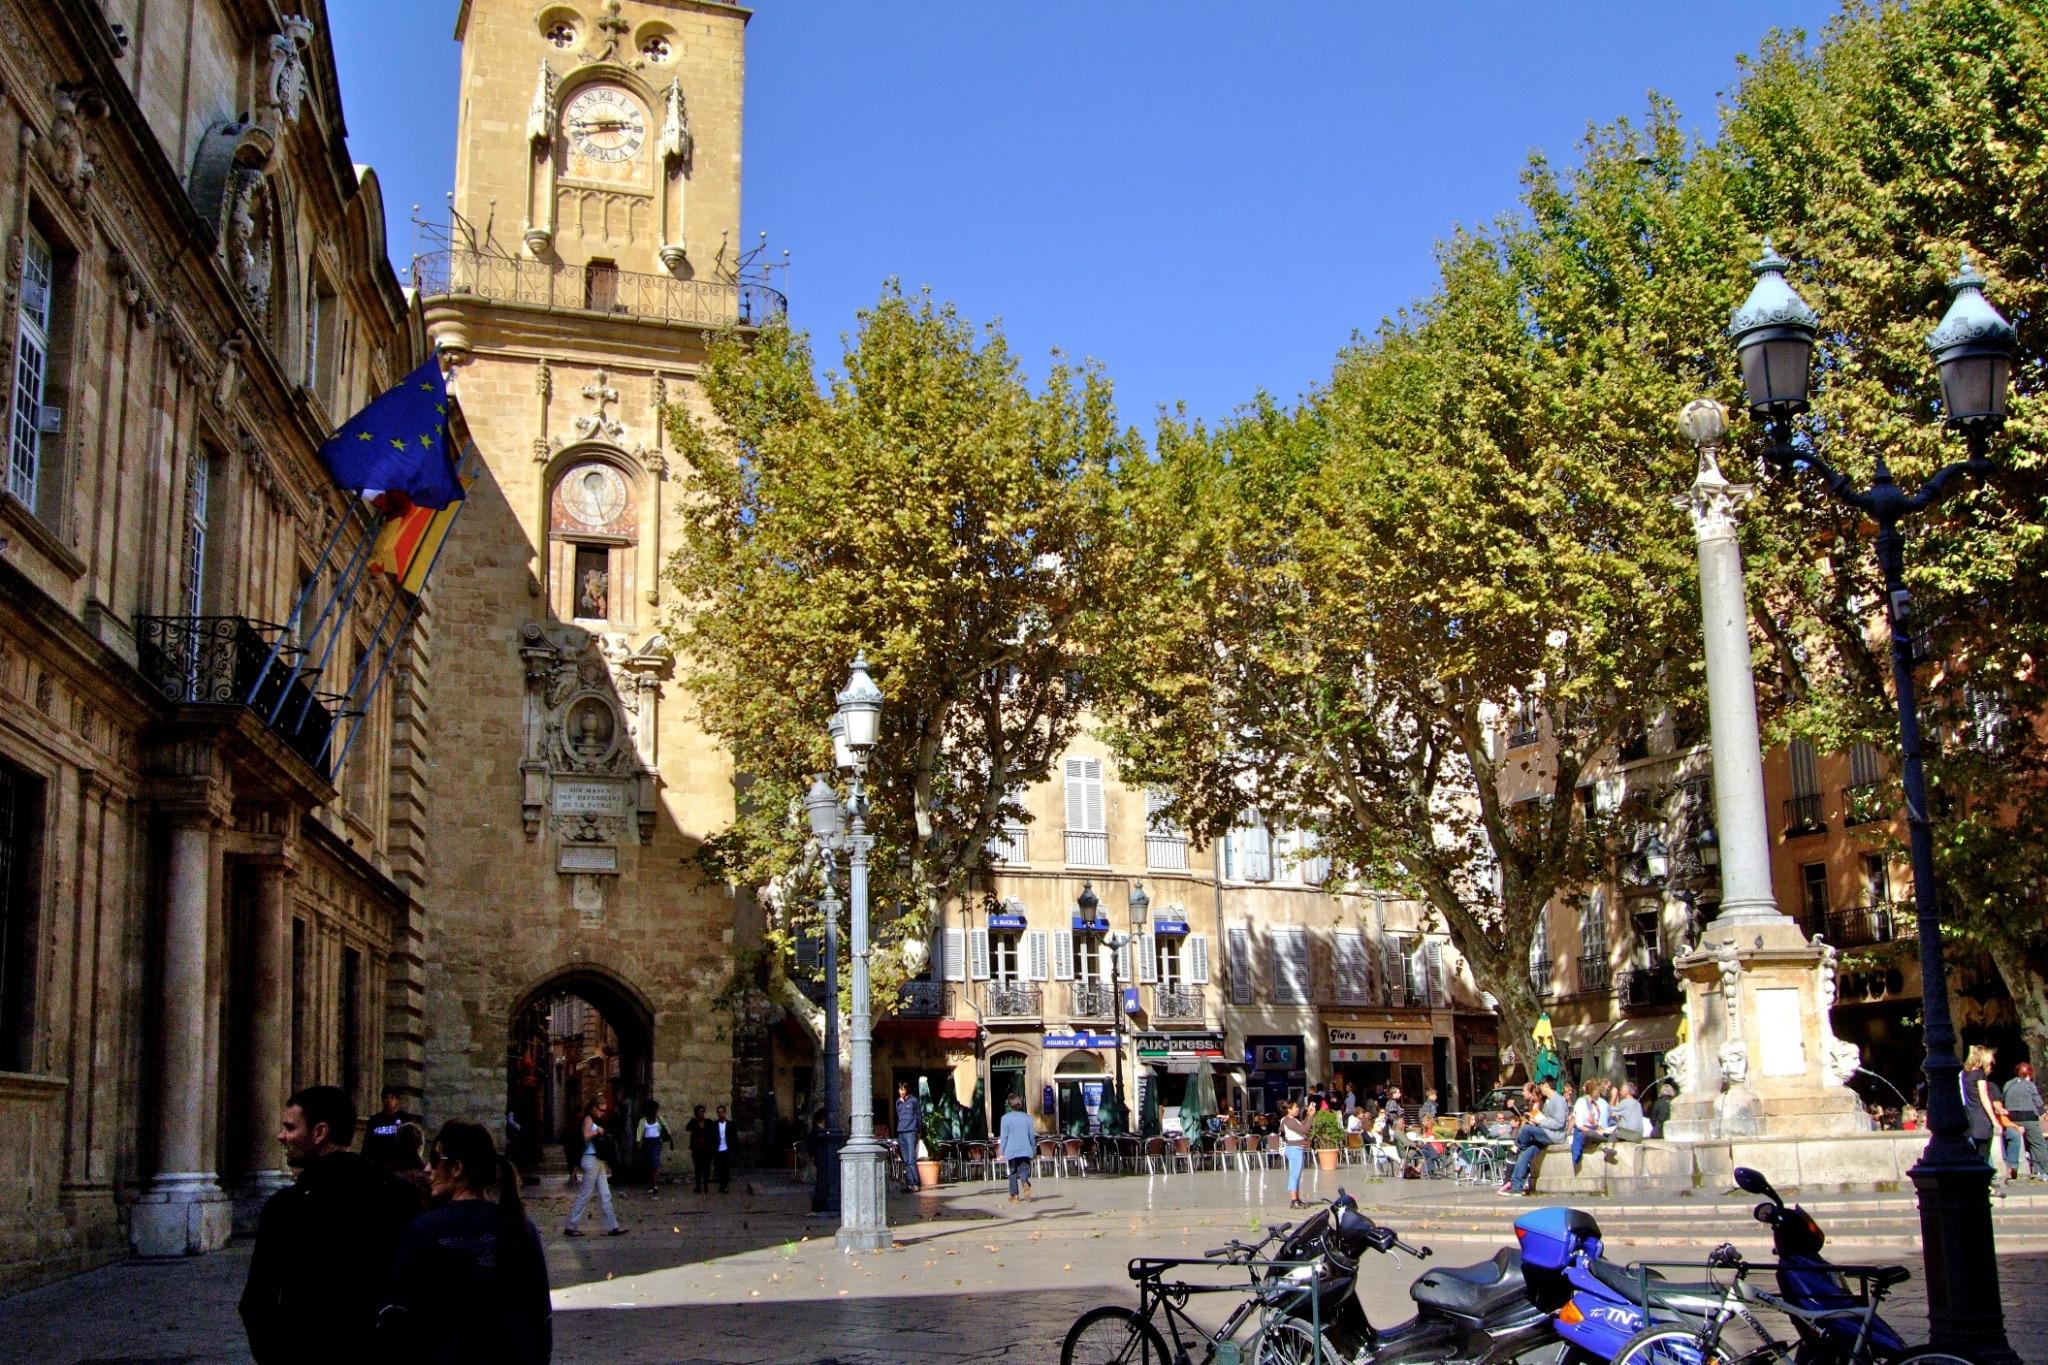 Улочки и площади Экс-ан-Прованса